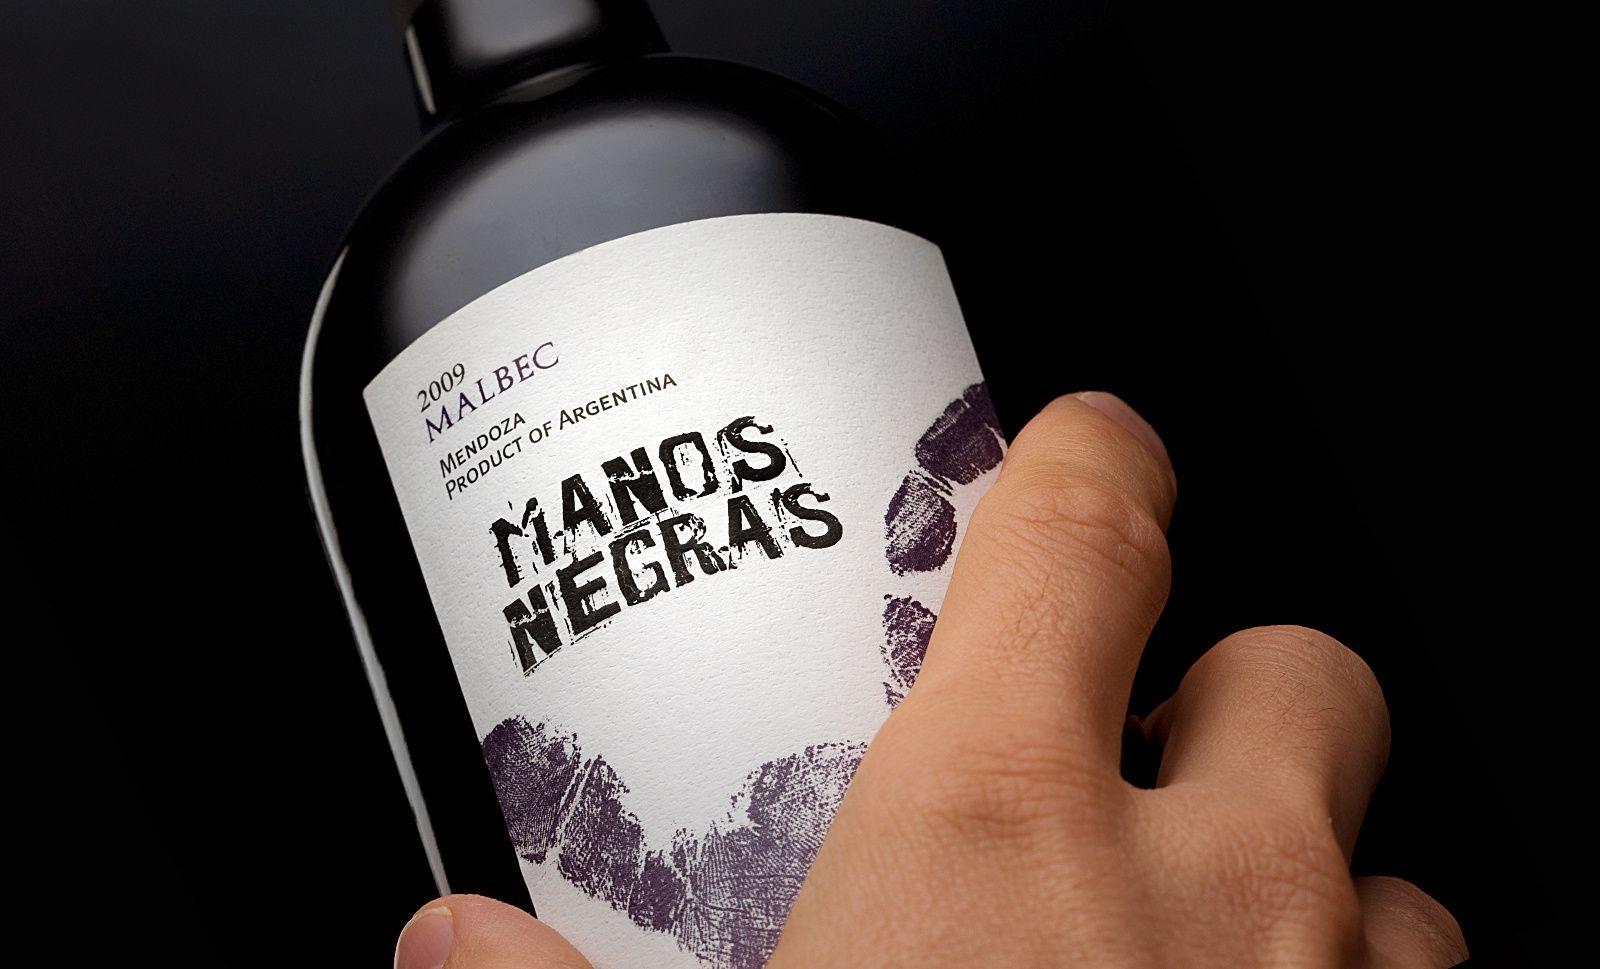 Mano Negras (vin argentin) | Design : Tao Design Argentina, Buenos Aires, Argentine (août 2016)